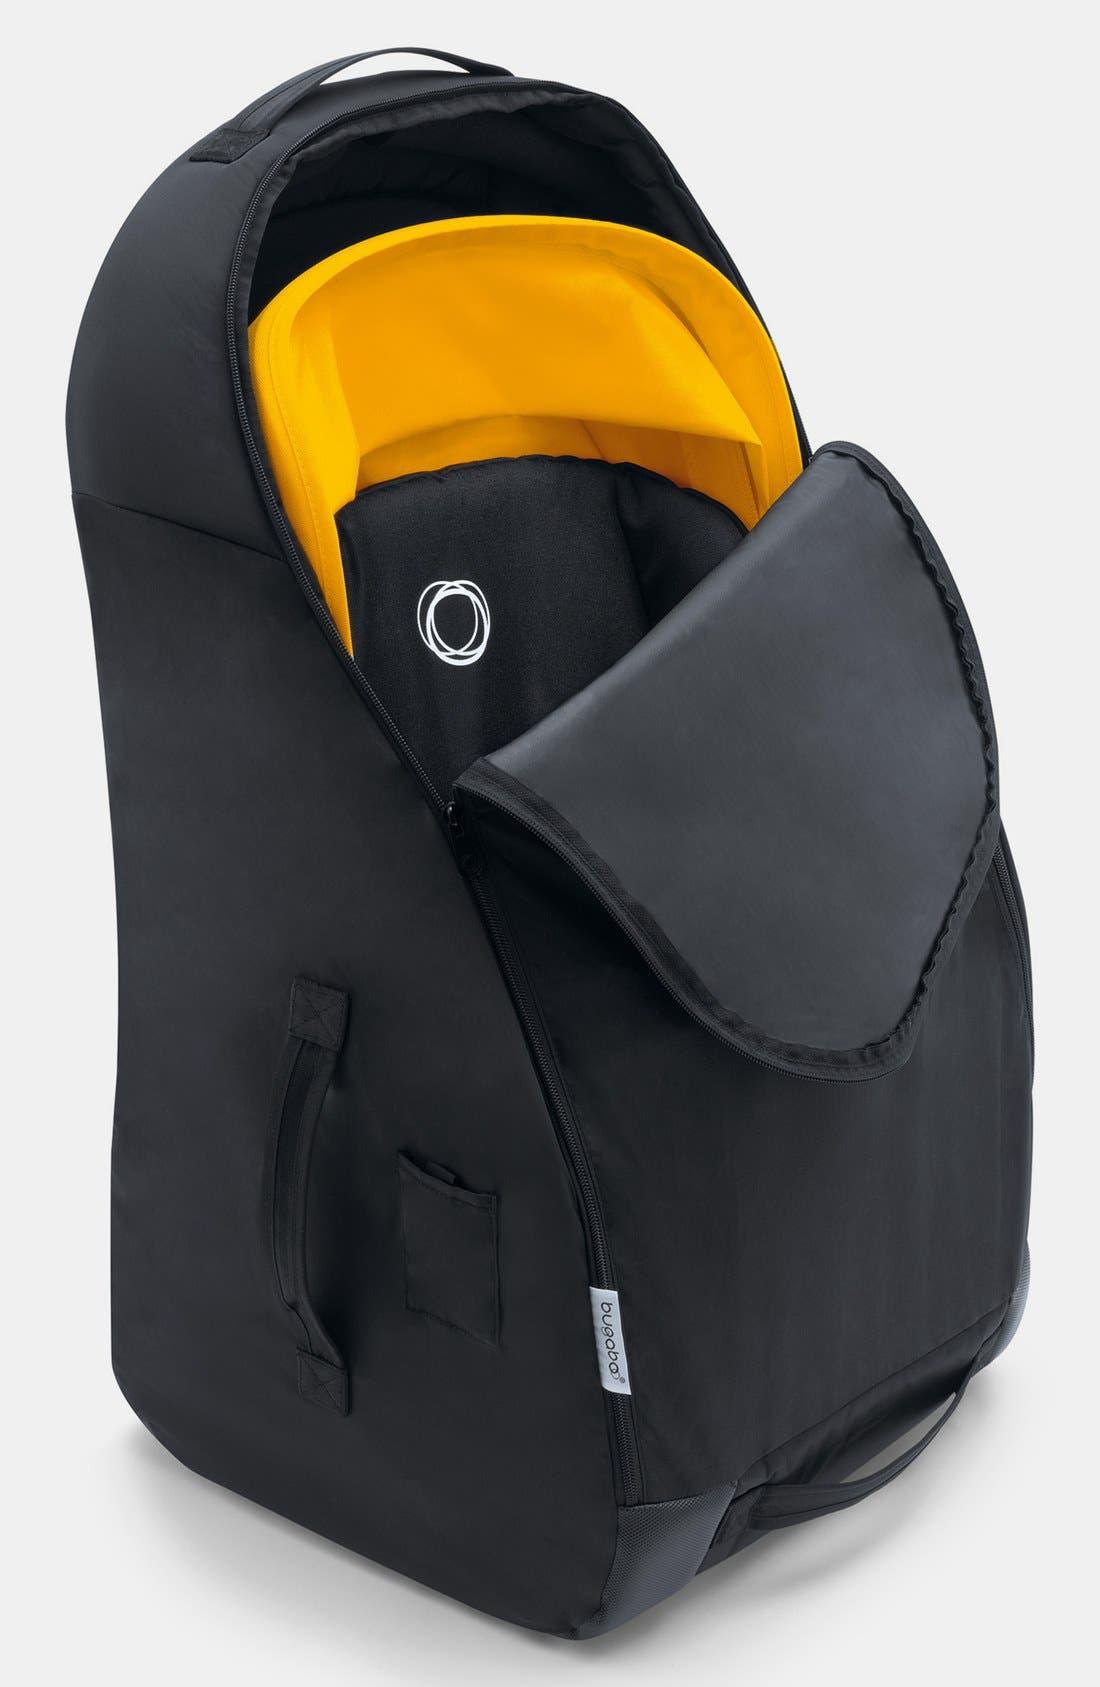 Alternate Image 2  - Bugaboo 'Bee' Compact Stroller Transport Bag